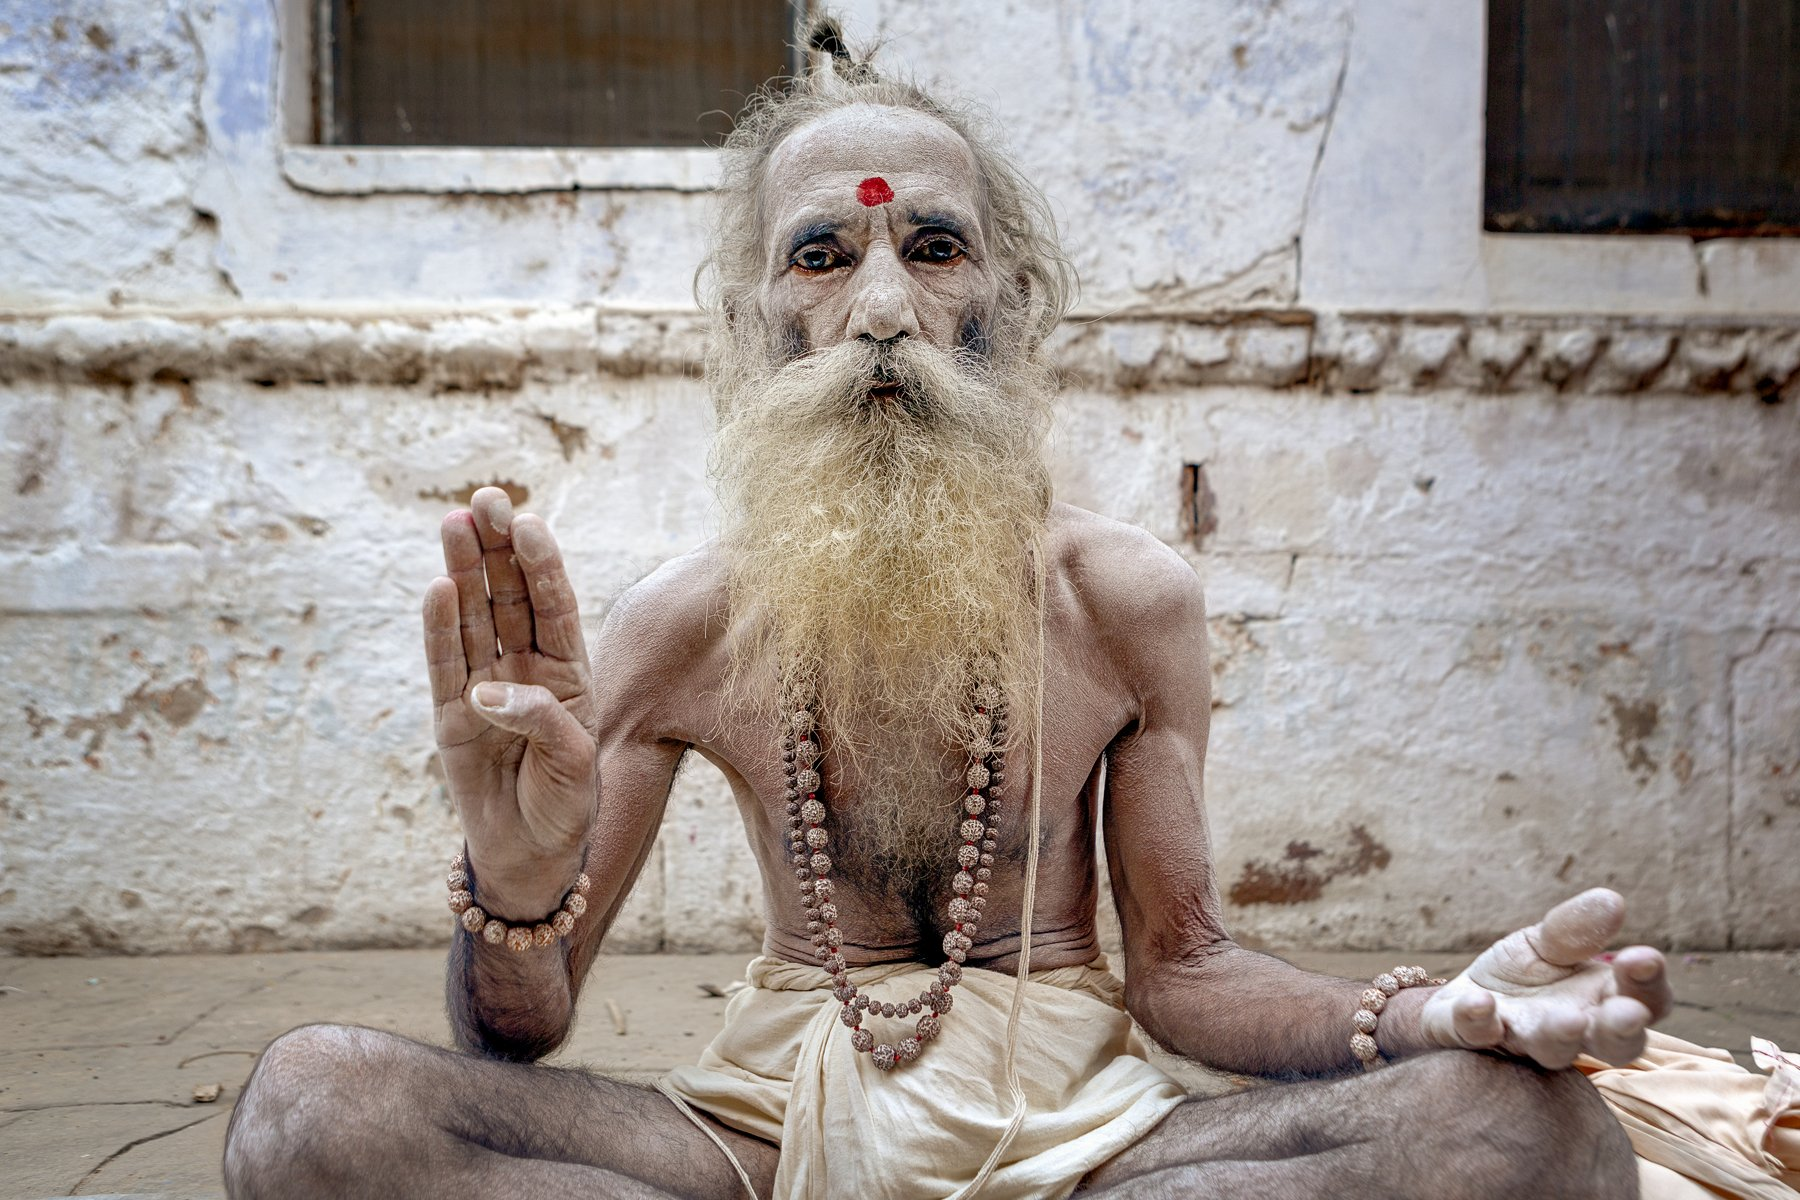 yancho sabev, sadhu, india, varanasi, male, portrait, outdoor, religion, hinduism, spirituality, holy man, Sabev Yancho